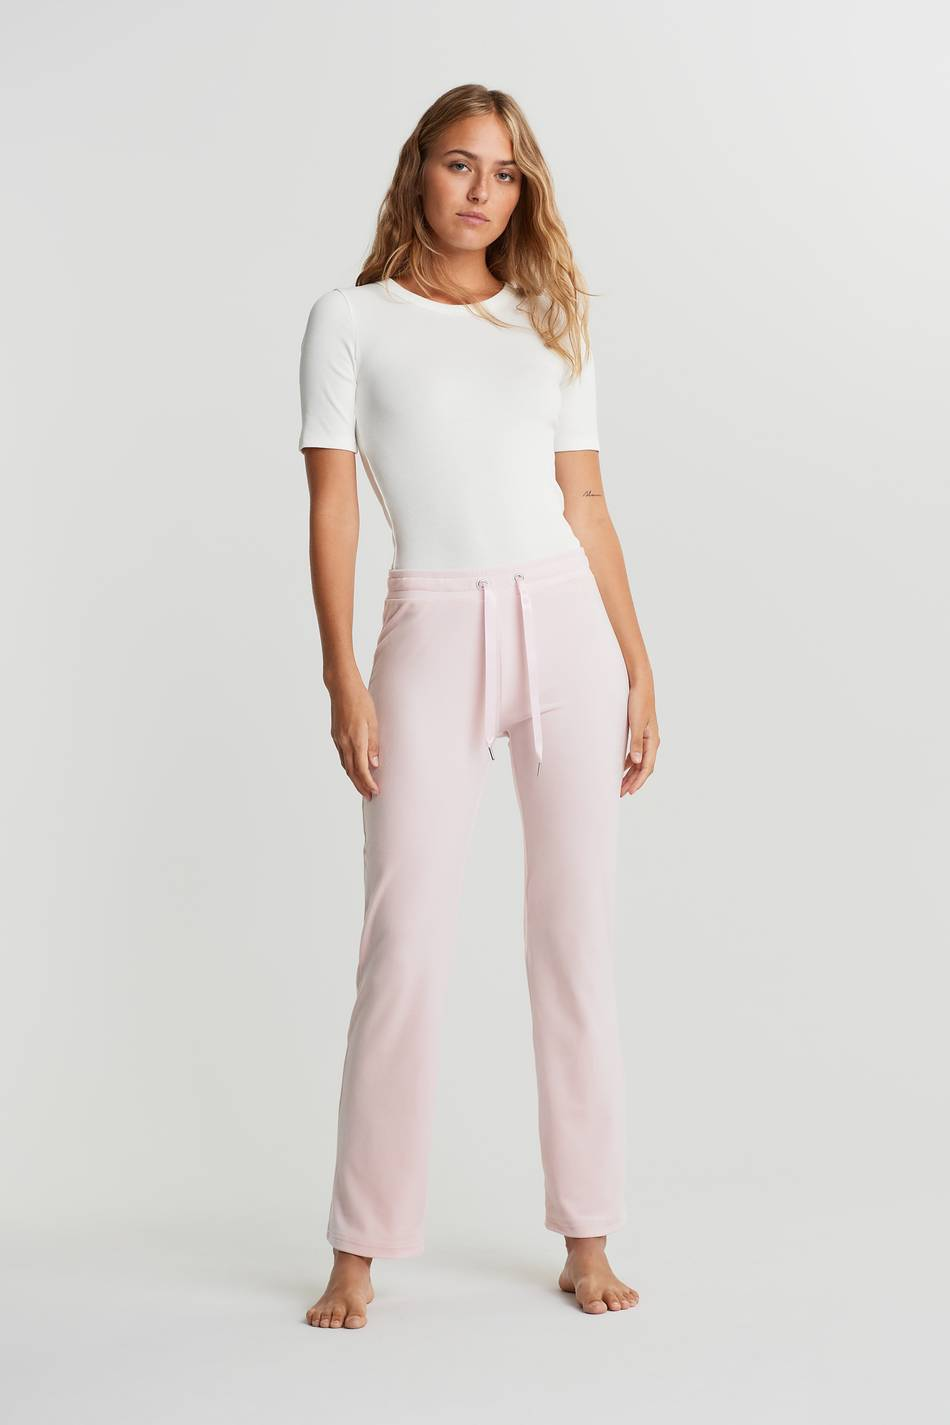 Gina Tricot Cecilia velour trousers L Female Light pink